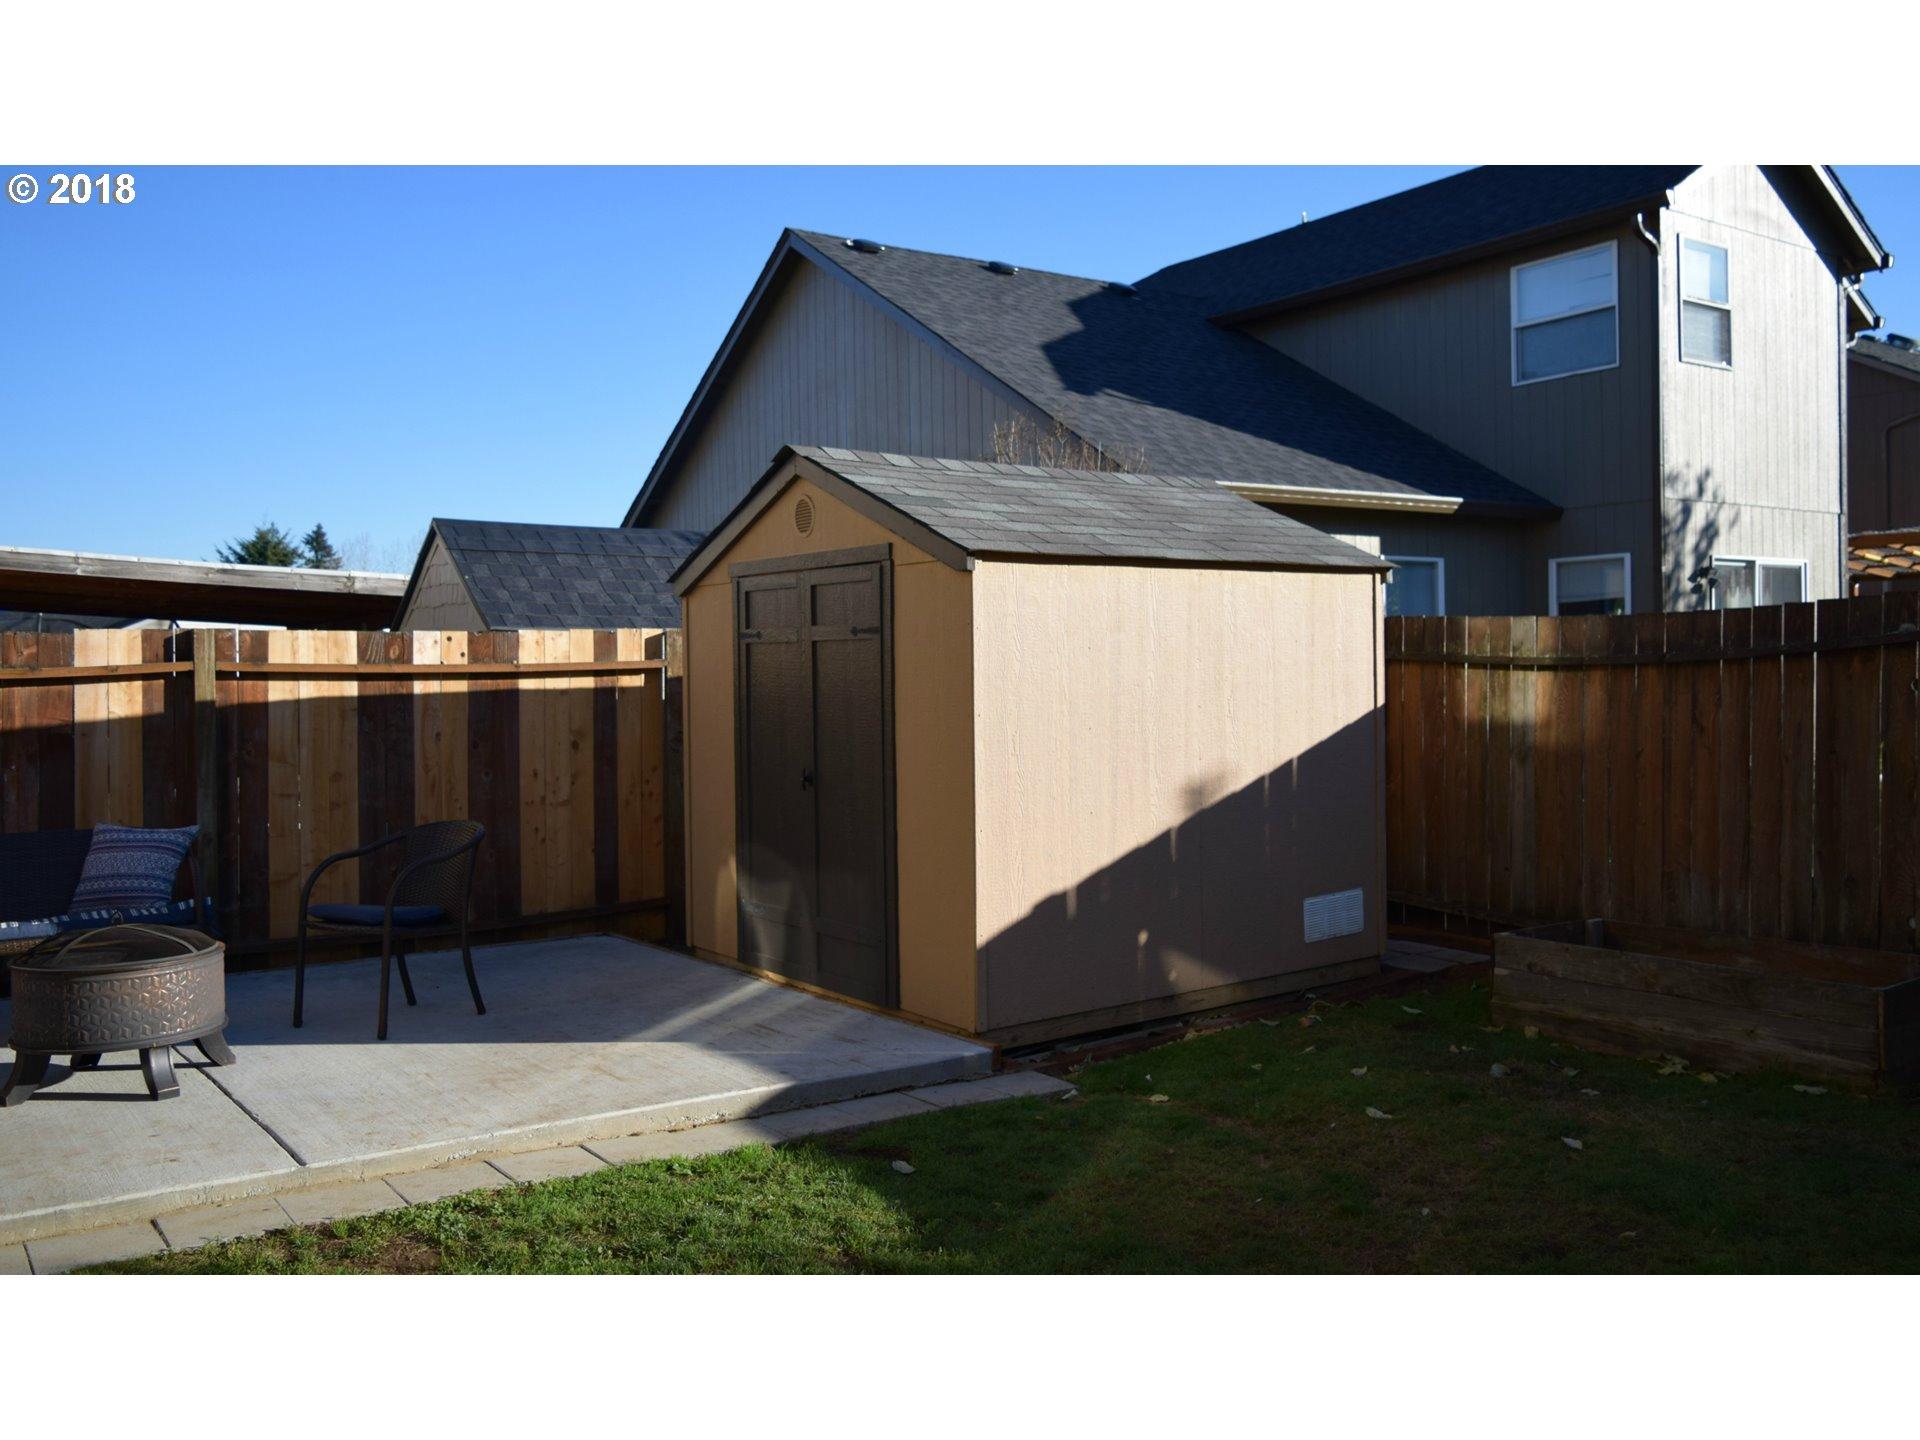 15715 NE 87TH CIR Vancouver, WA 98682 - MLS #: 18508918